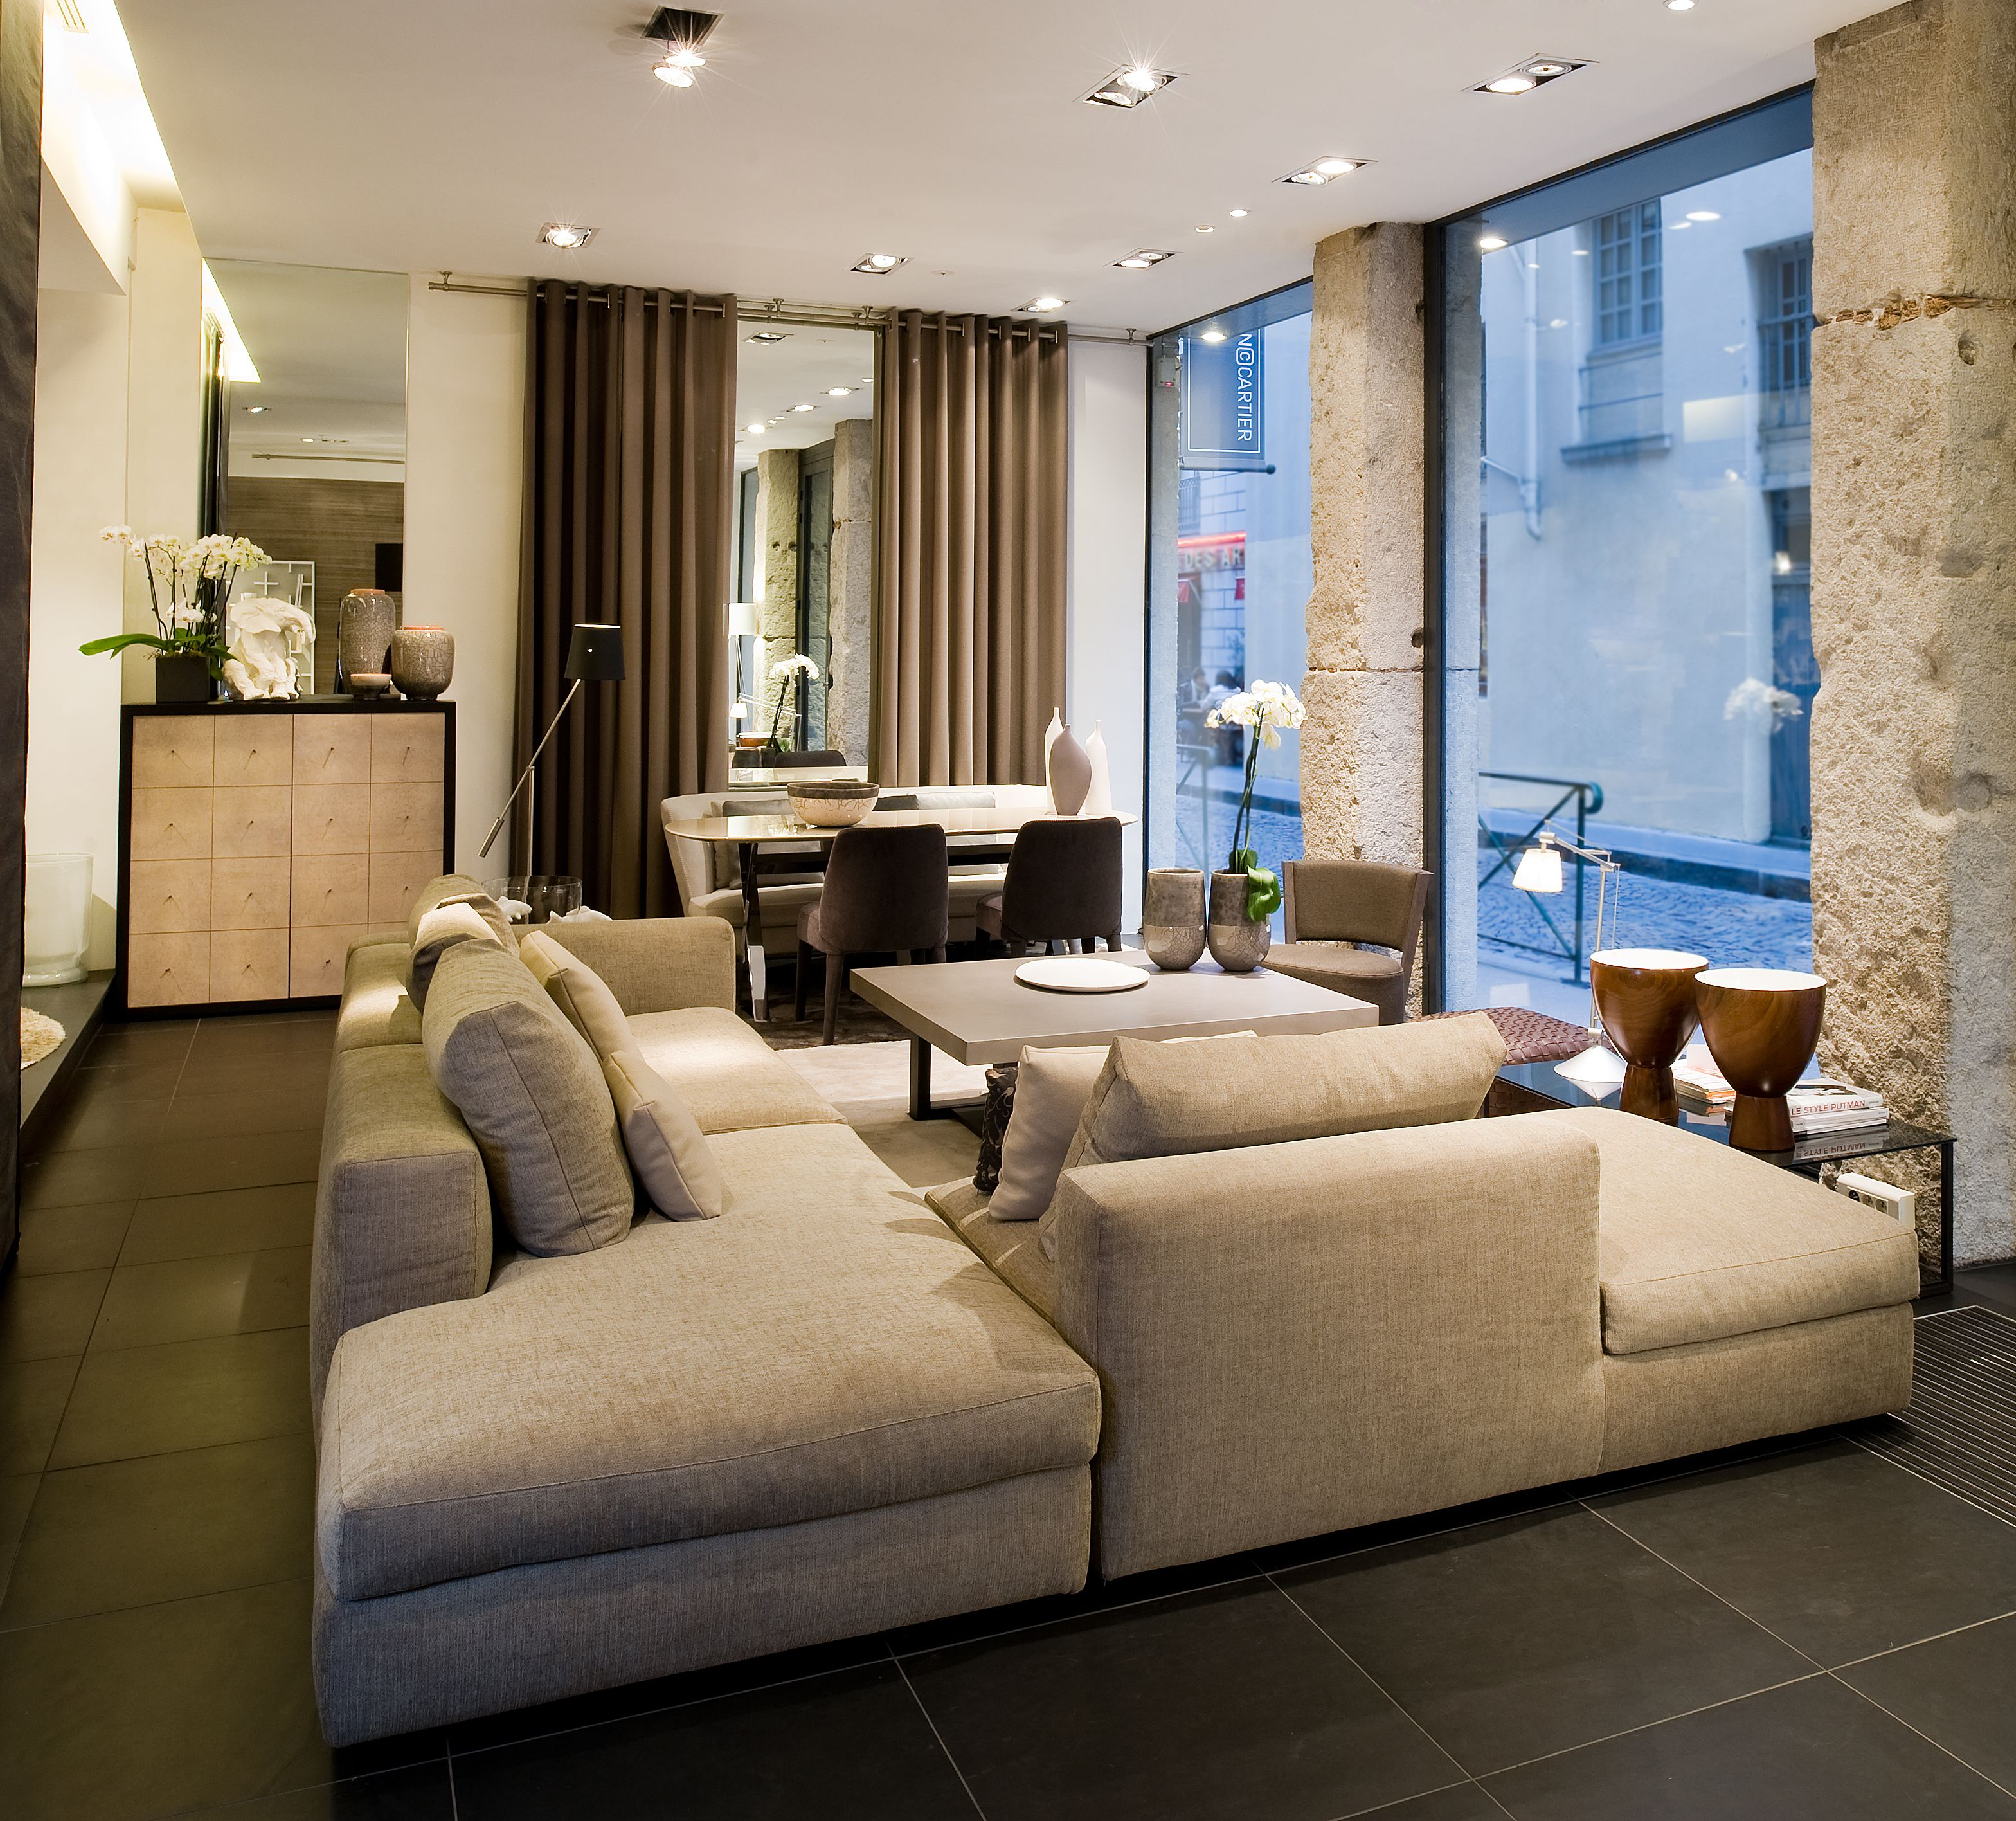 Claude Cartier Decoration Mobilier Contemporain Lyon Canape Marea Arketipo Interior Architecture Interior Design Home